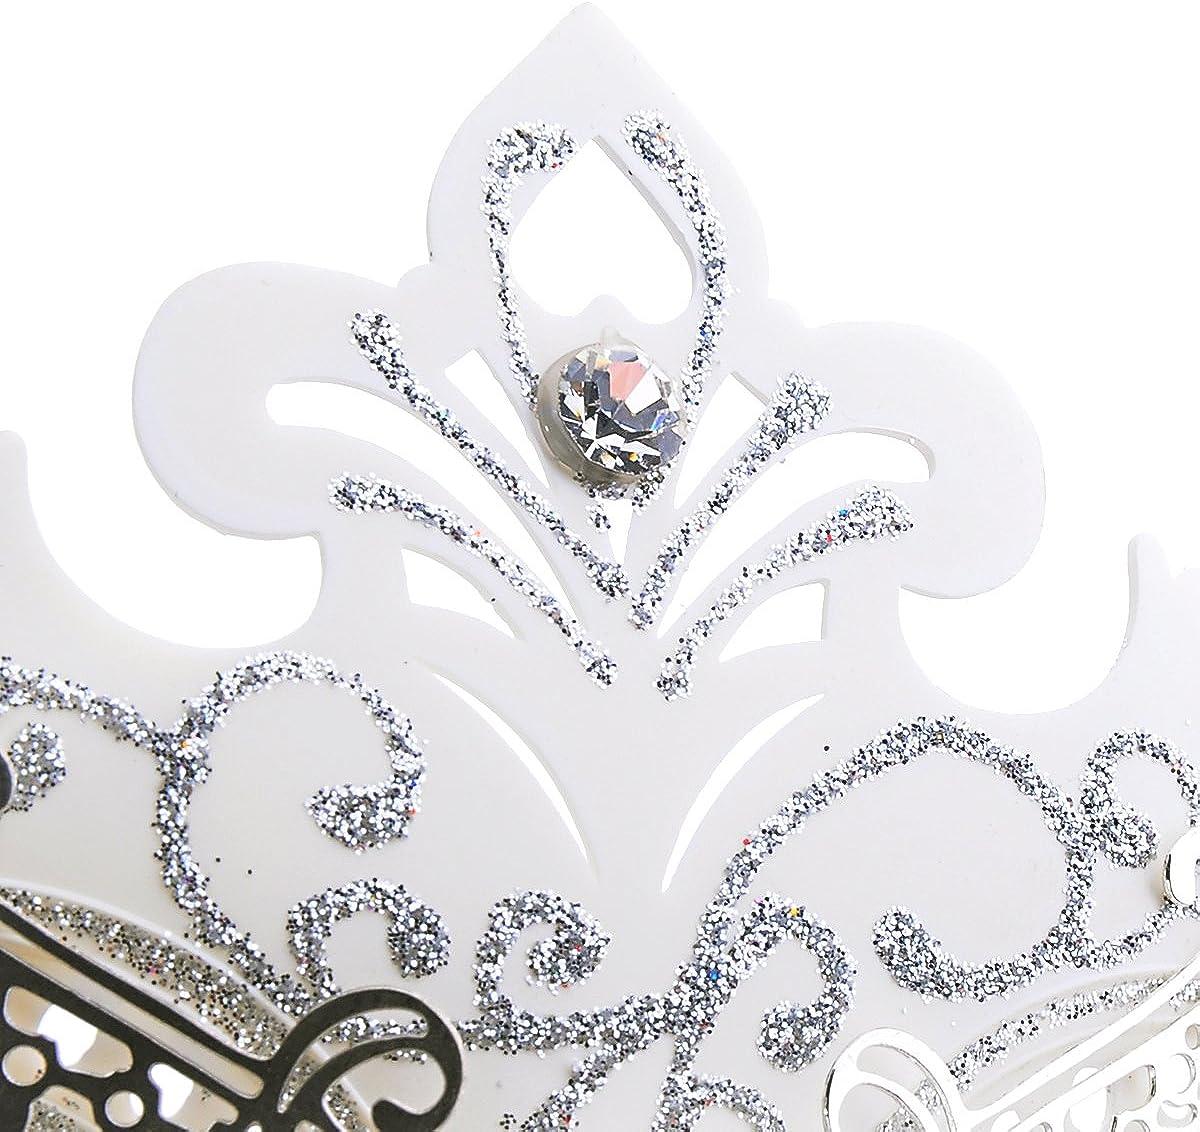 Coxeer Masquerade Mask on Stick Halloween Mask Metal Laser Cut Venetian Mask